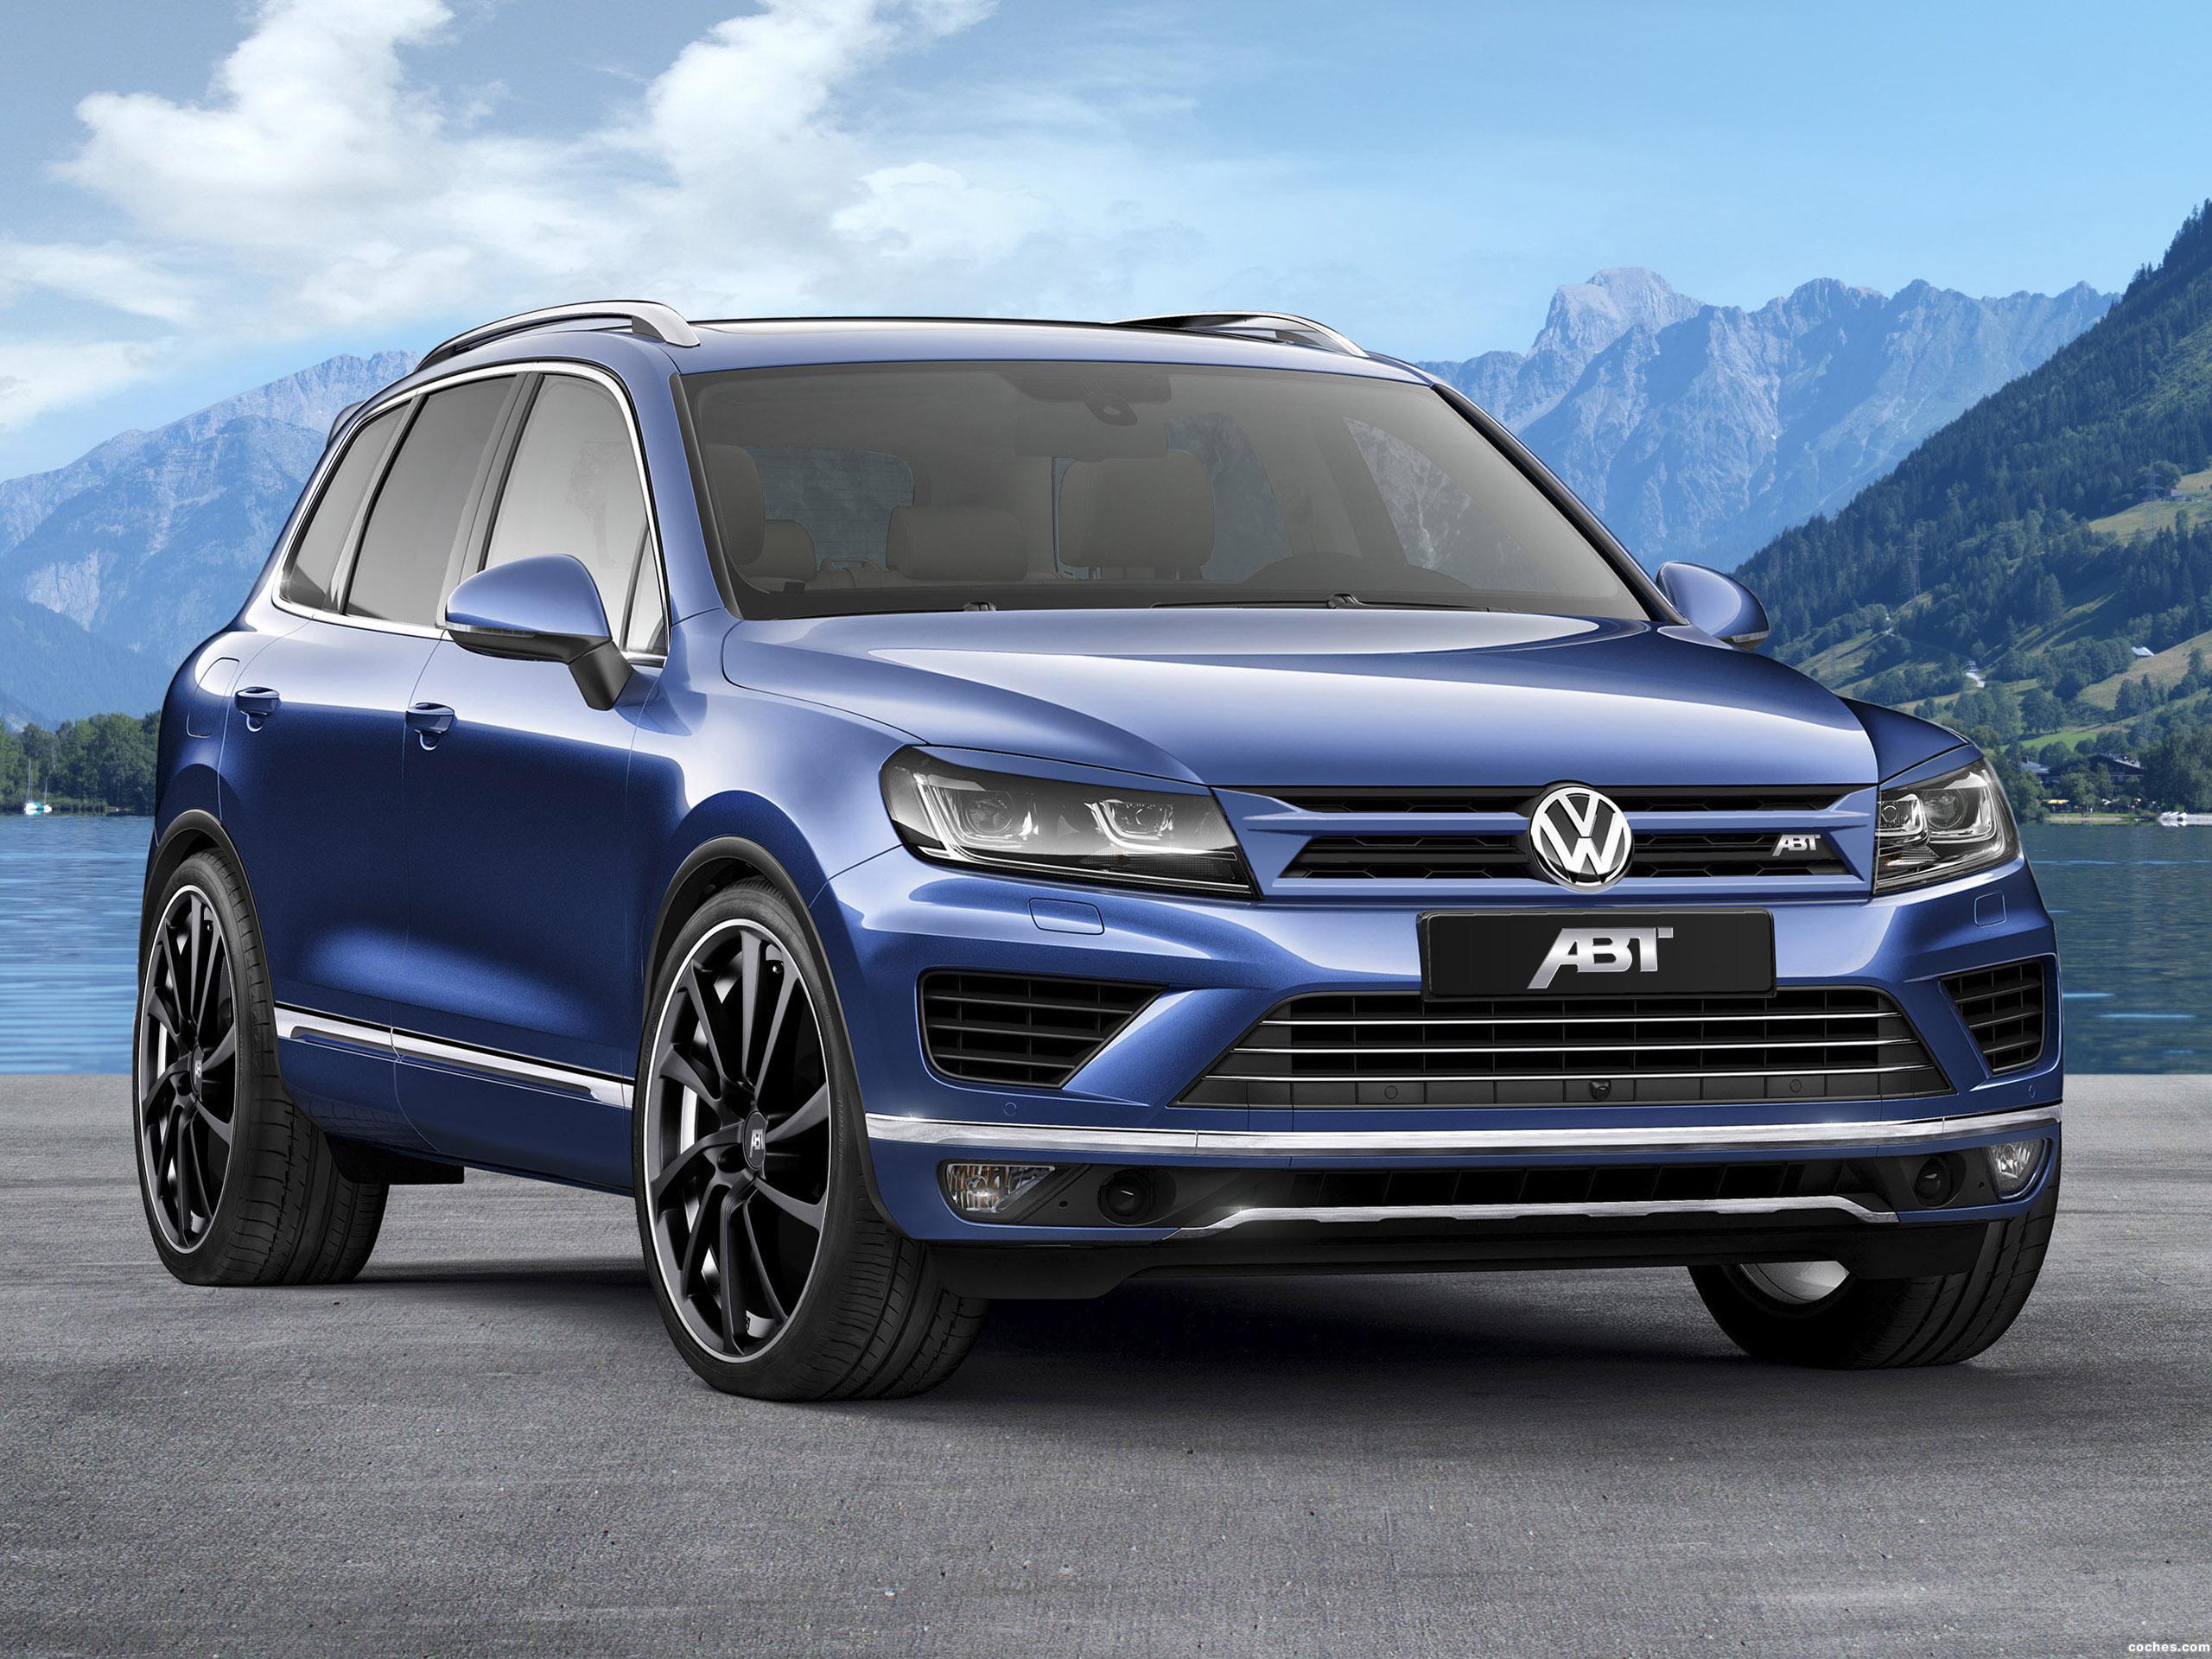 Foto 0 de Volkswagen ABT Touareg 2015